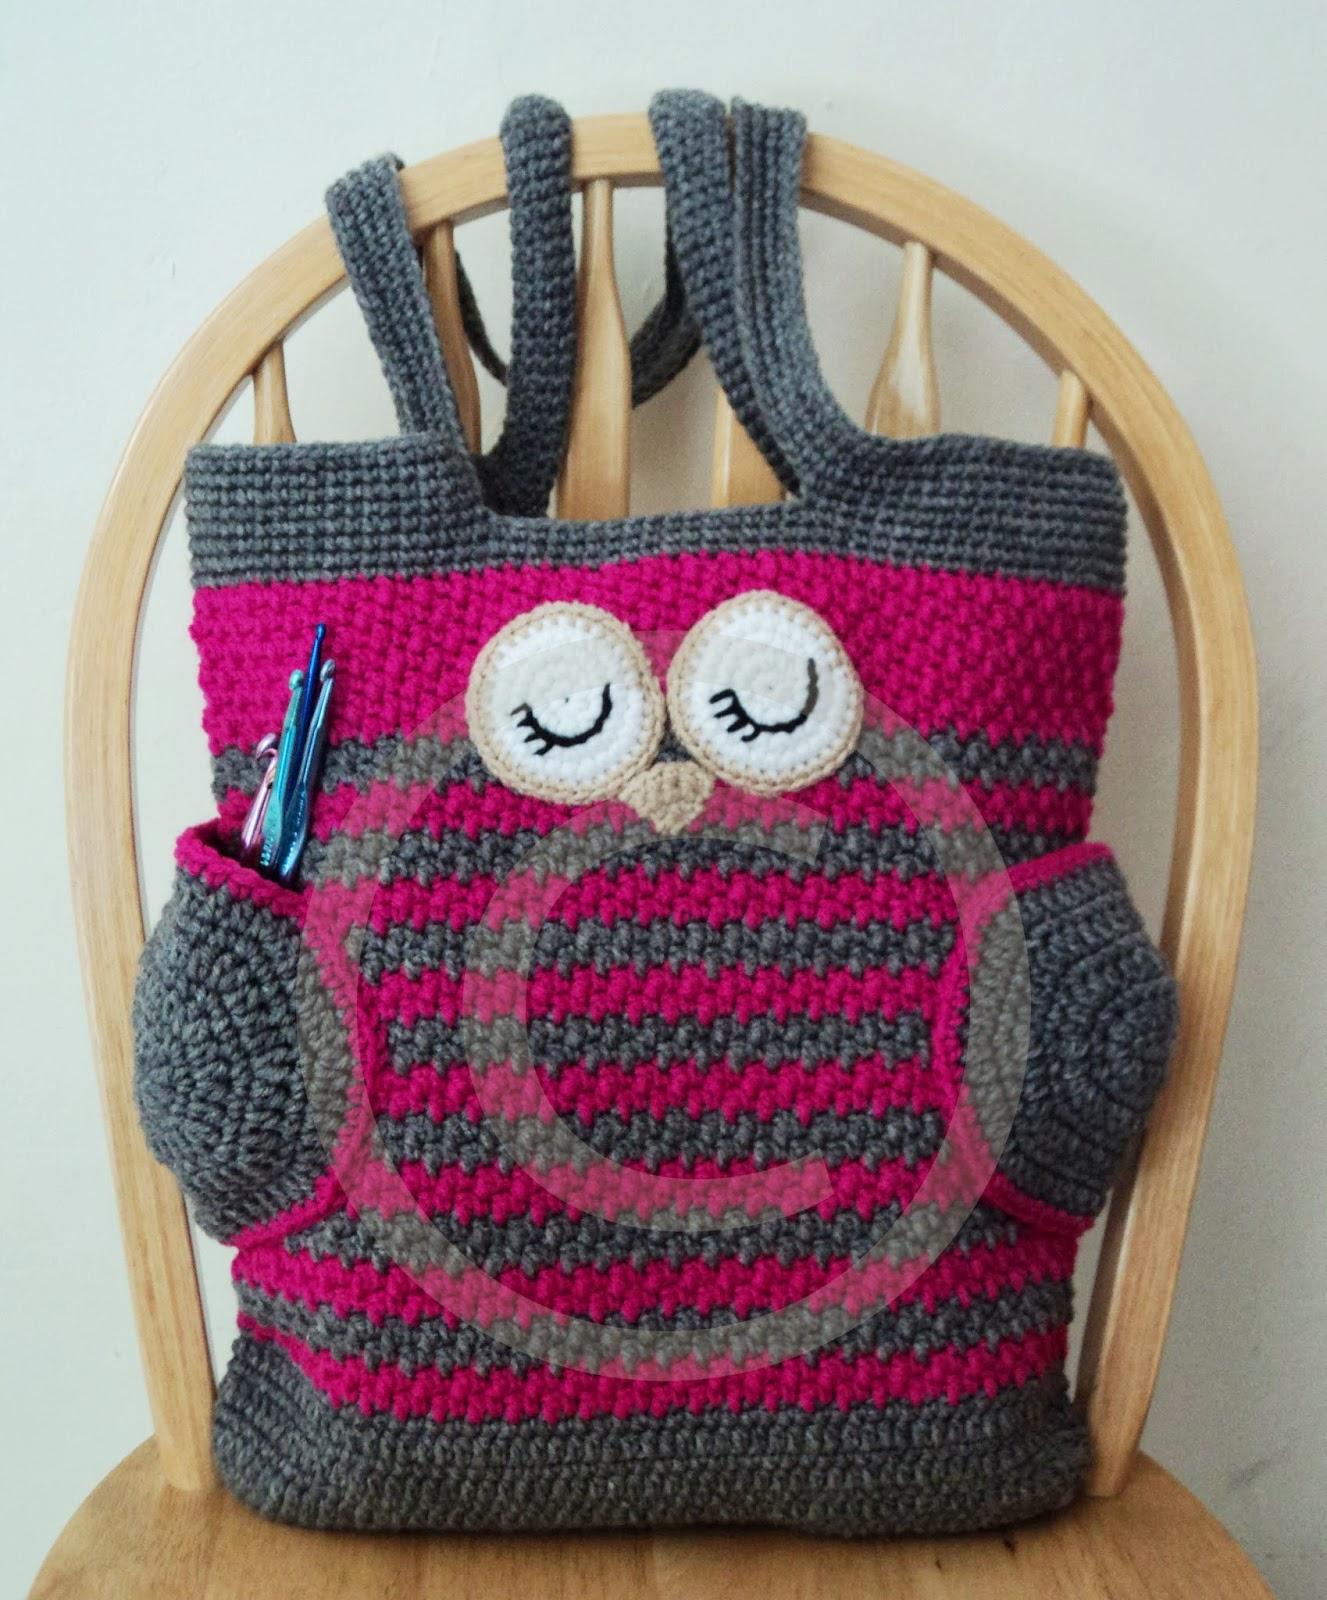 Crochet Pattern Tote Bag : Cute Little Crafts: Crochet Pattern:Sleepy Owl Tote Bag